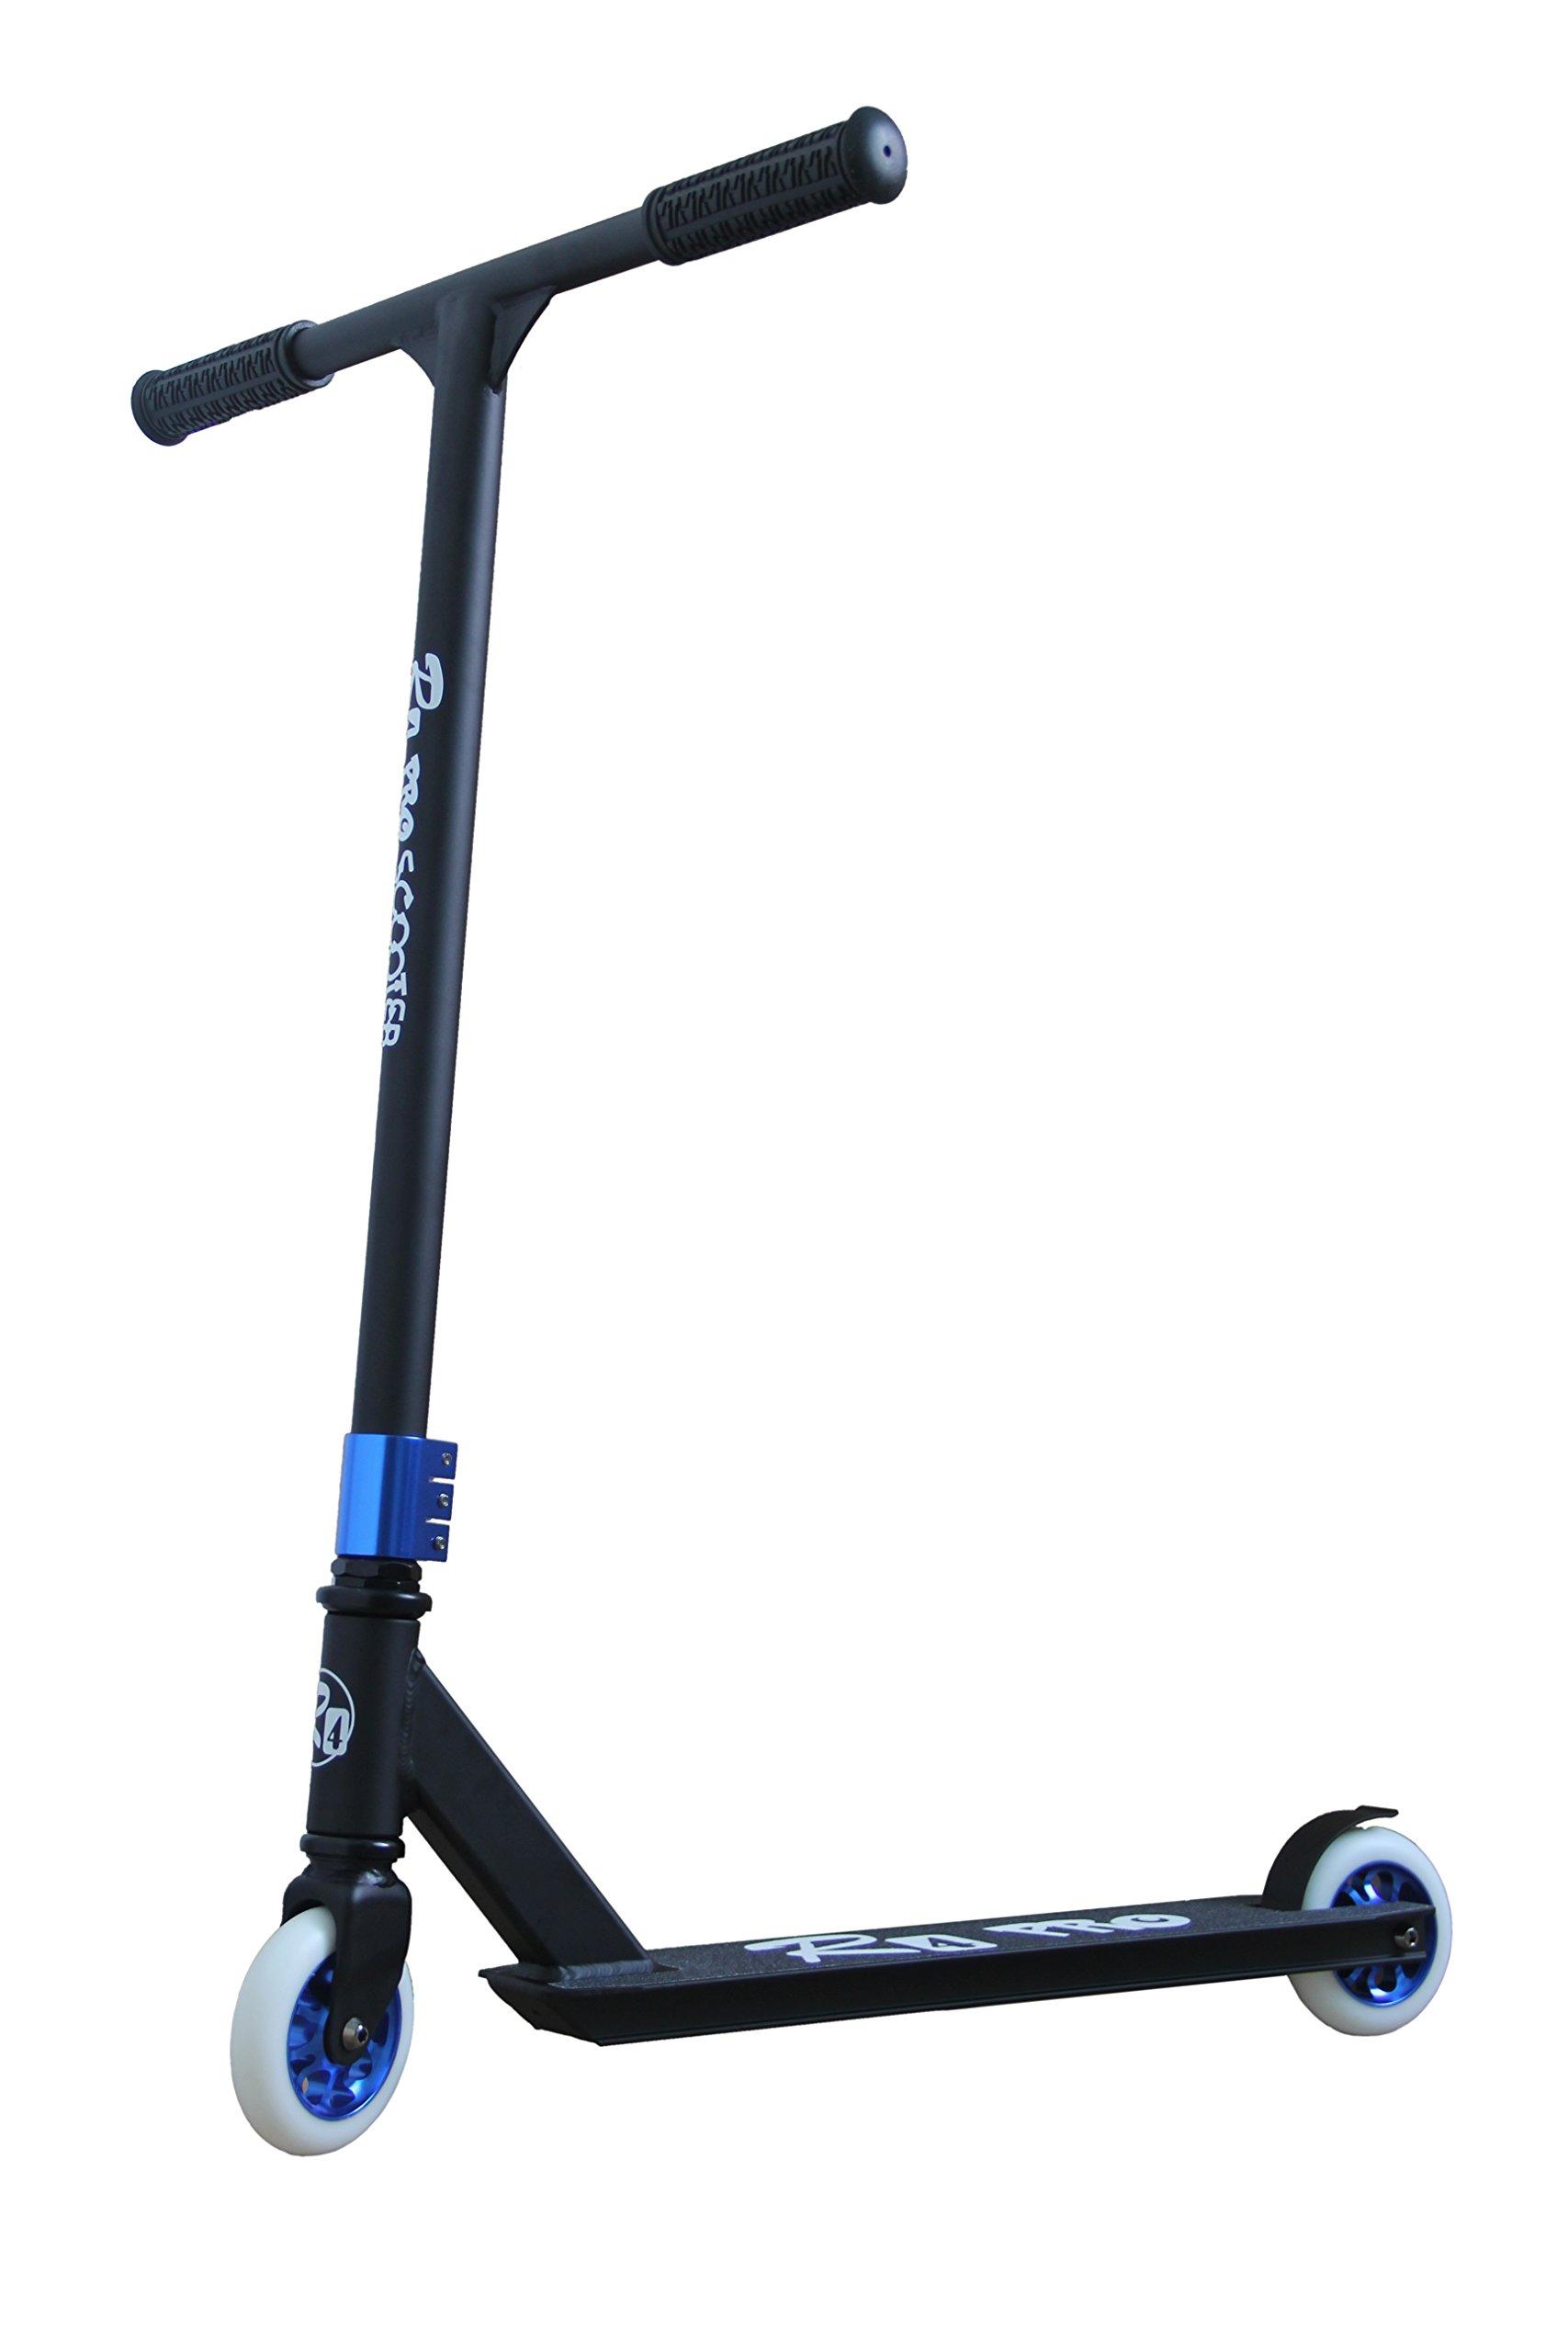 R4 Aluminum Pro 6061 Complete Stunt Scooter, Matte Black & Blue